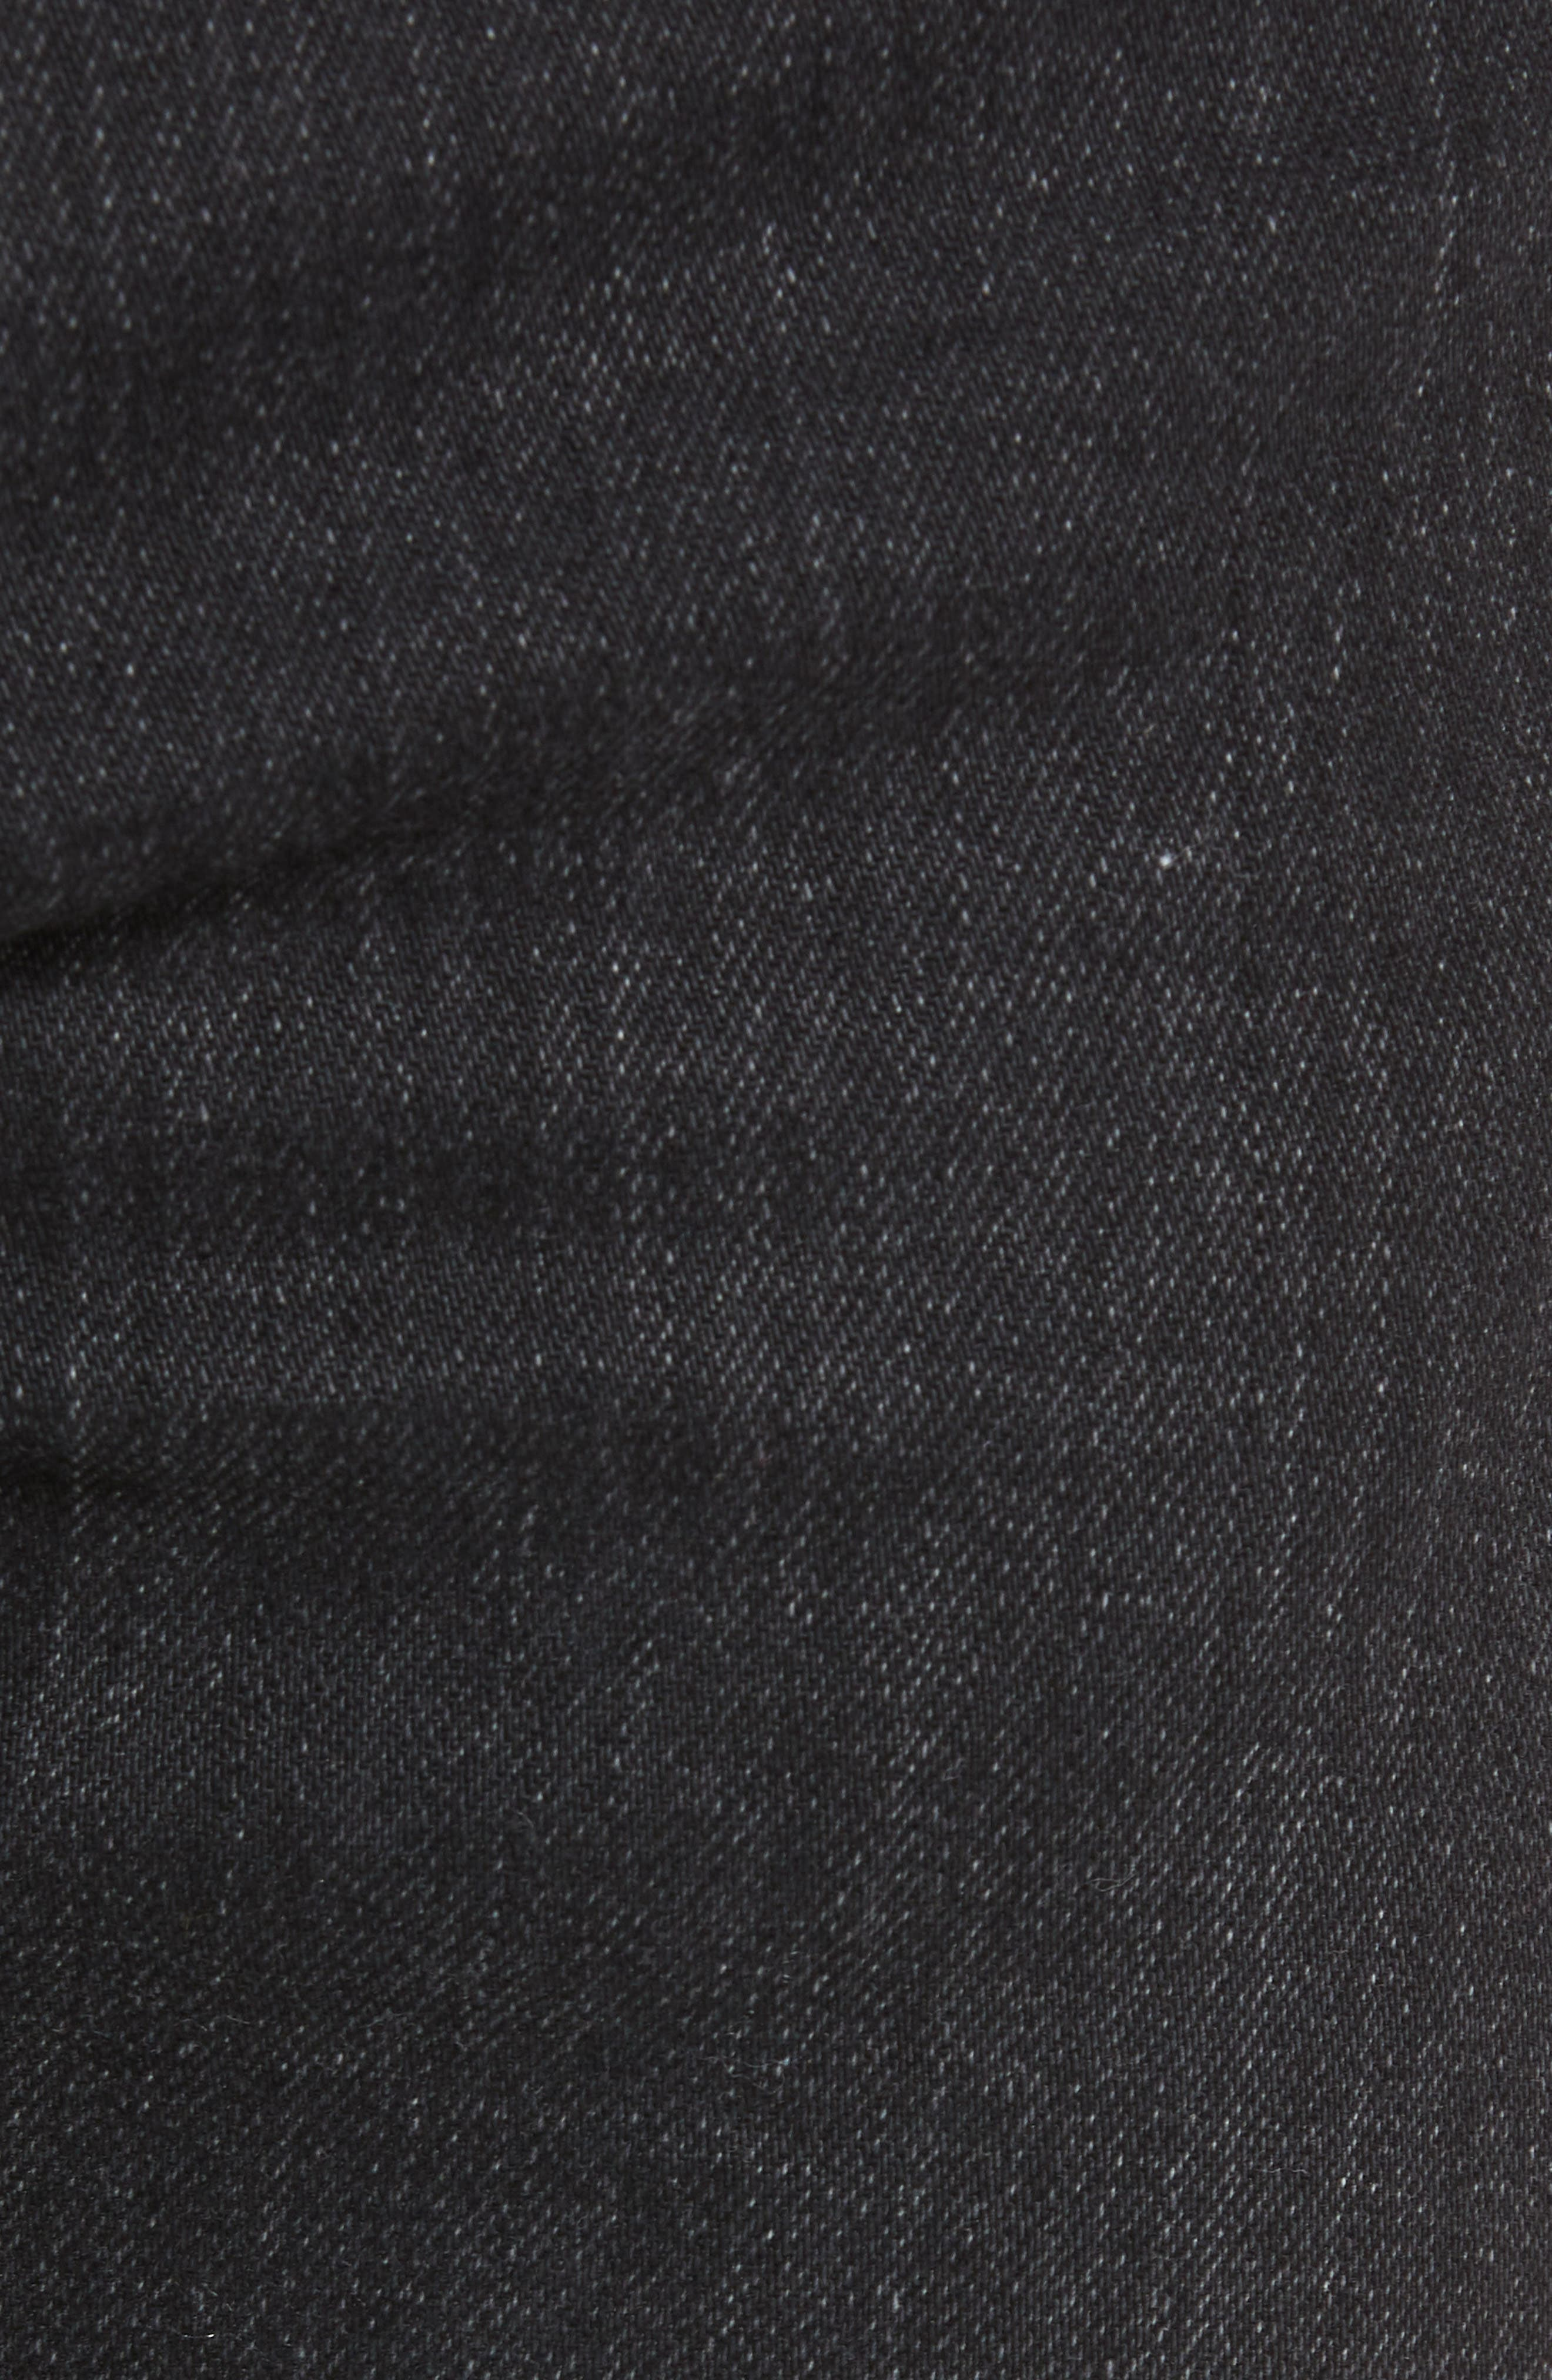 Tyler Slim Fit Jeans,                             Alternate thumbnail 5, color,                             009